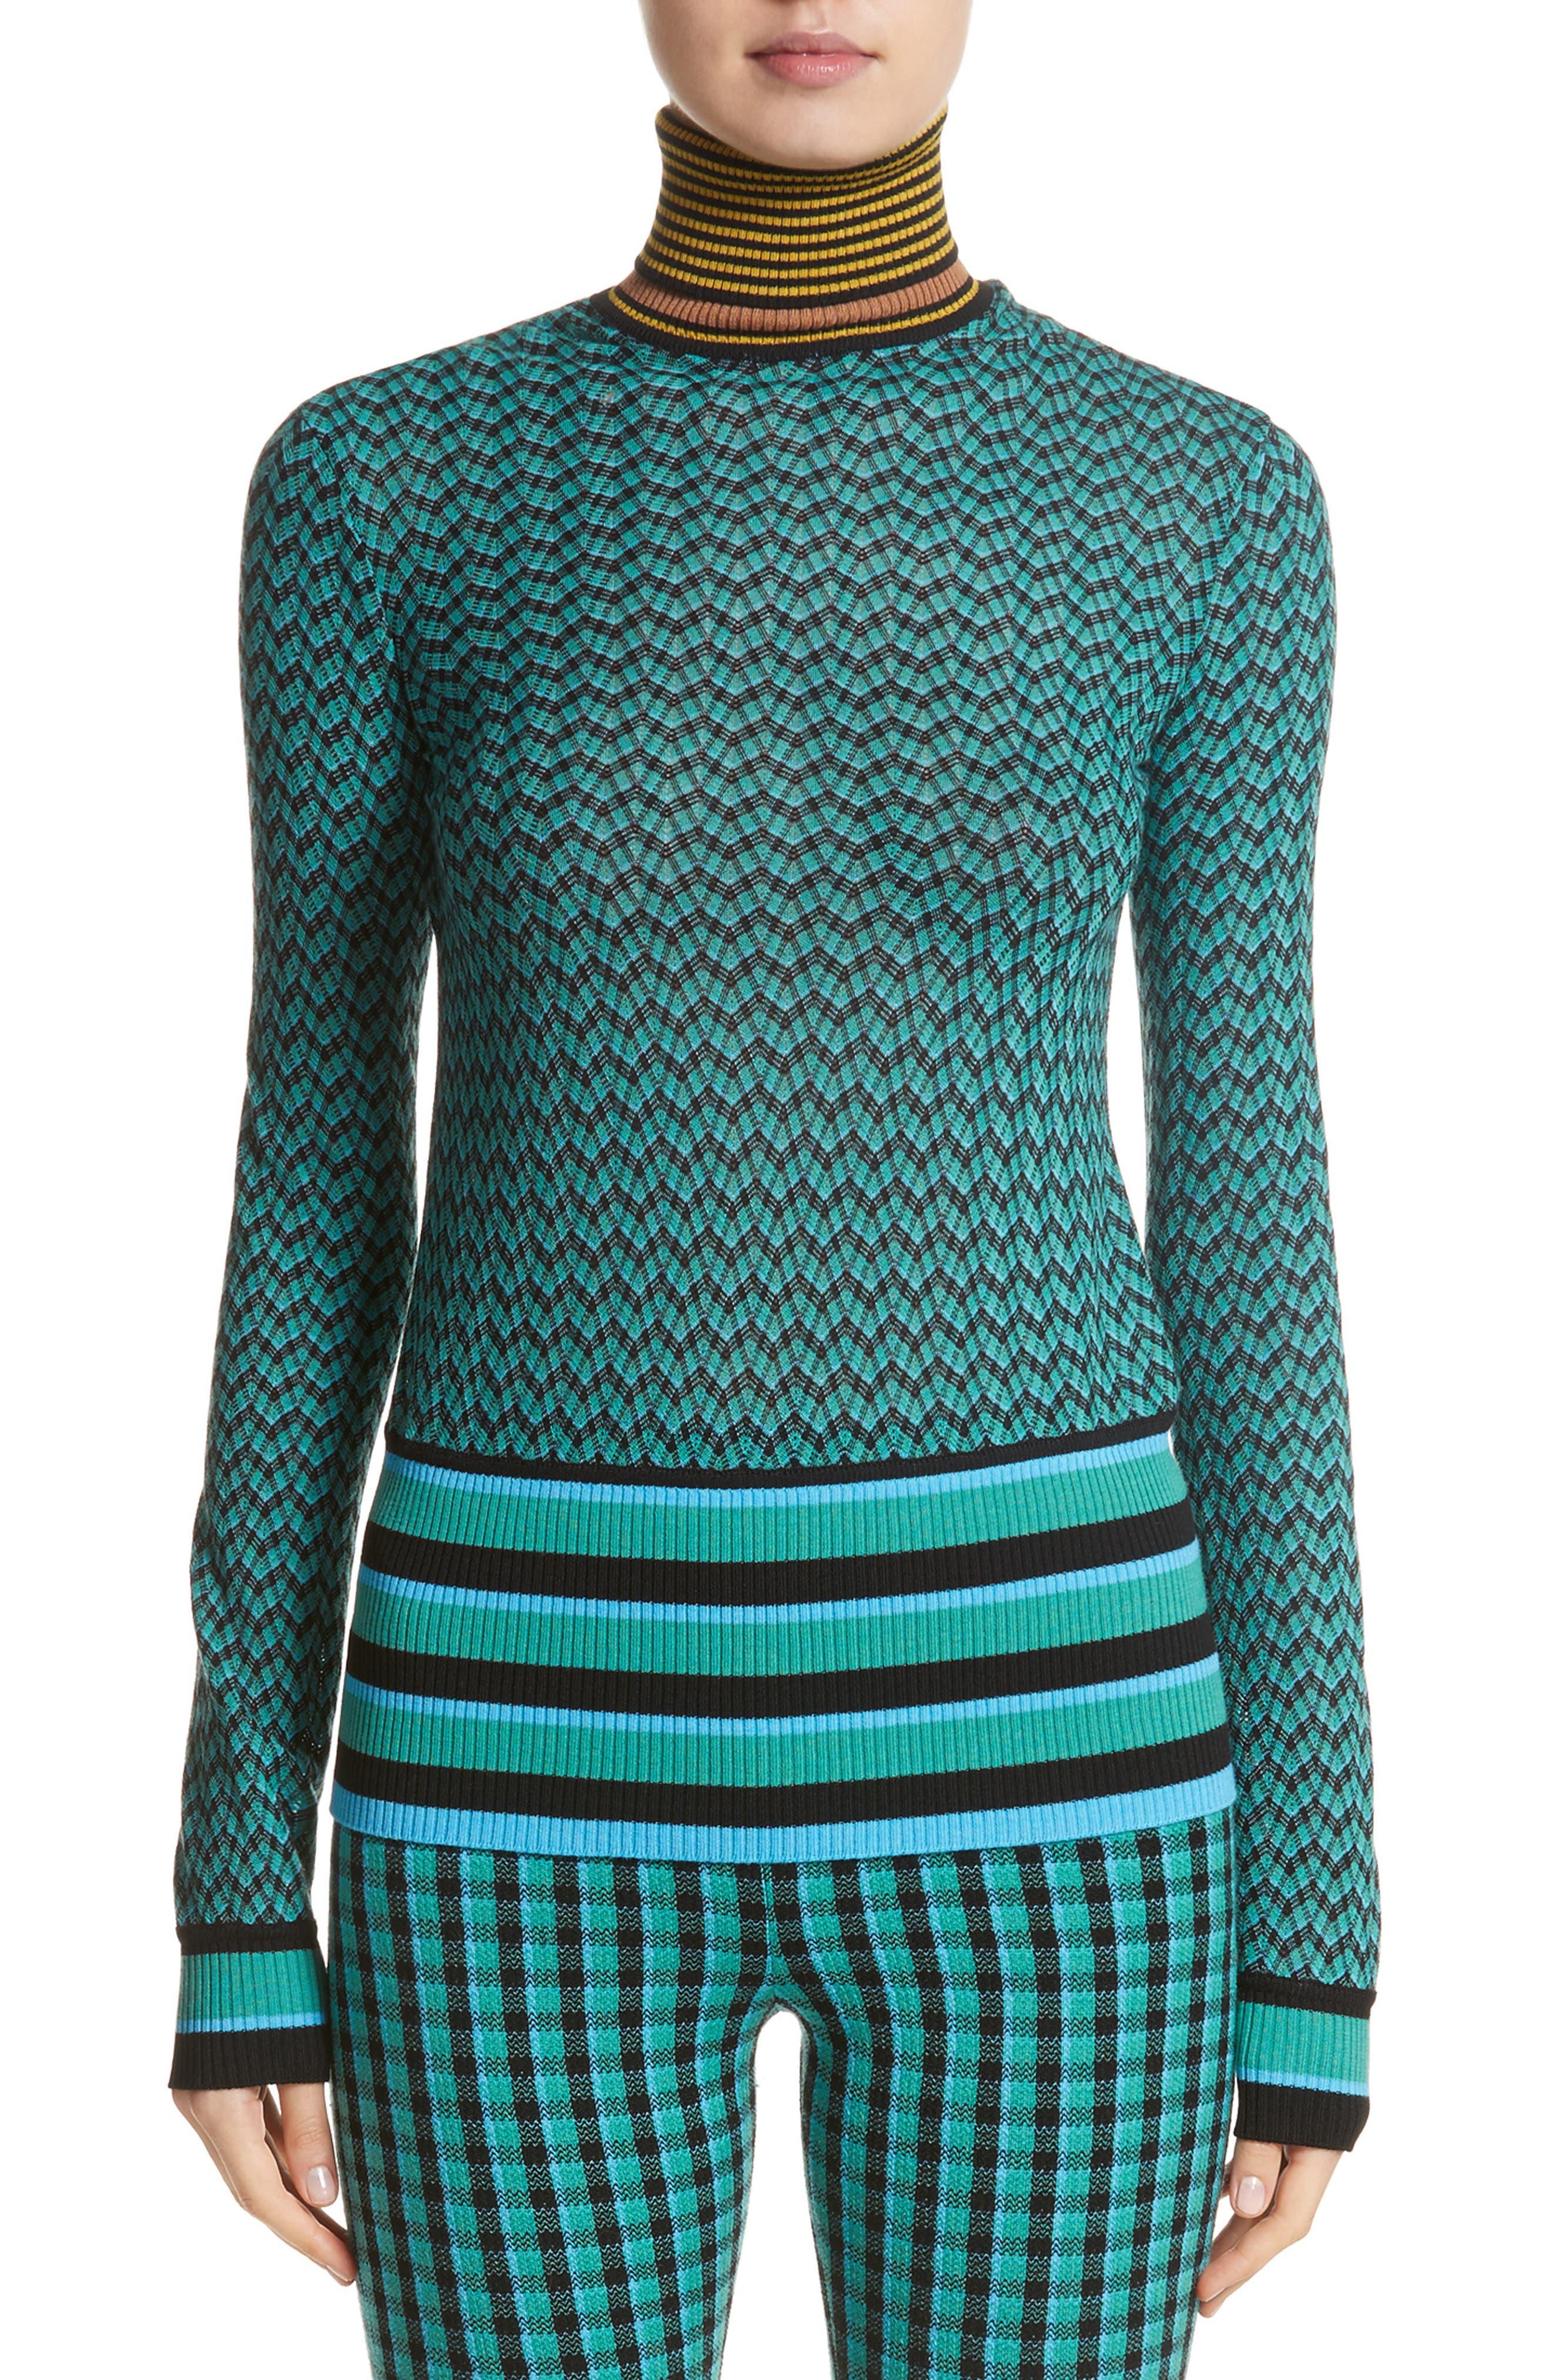 Zigzag & Stripe Mock Neck Sweater,                         Main,                         color, Green/ Blue